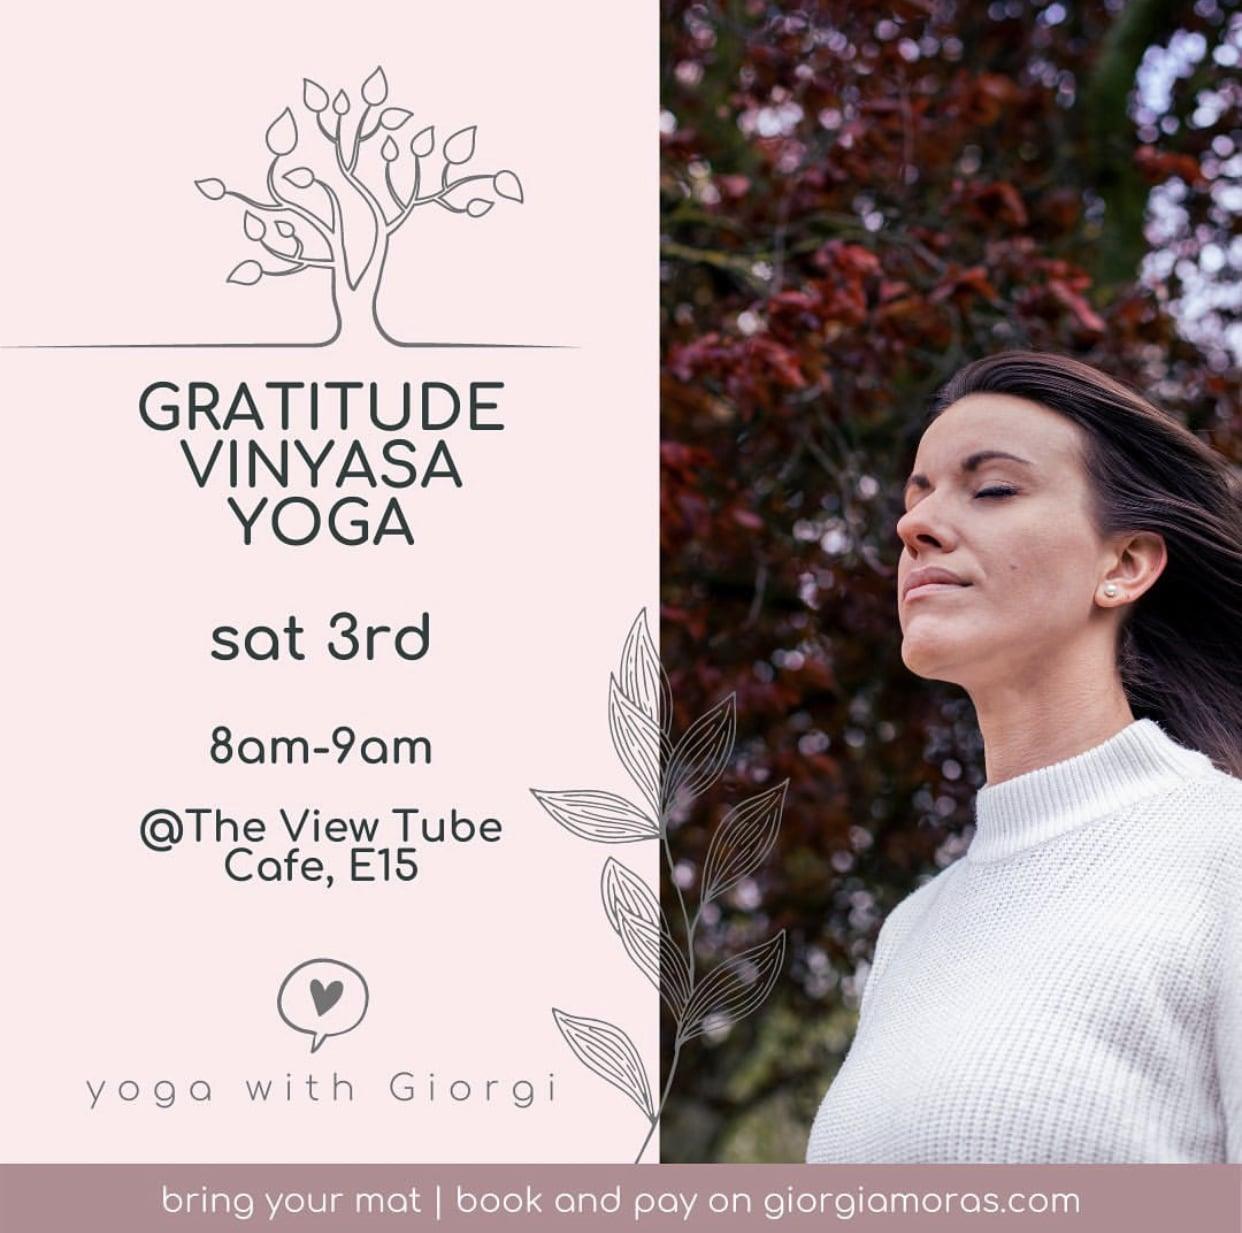 gratitude yoga, sat 3rd july 8am-9am